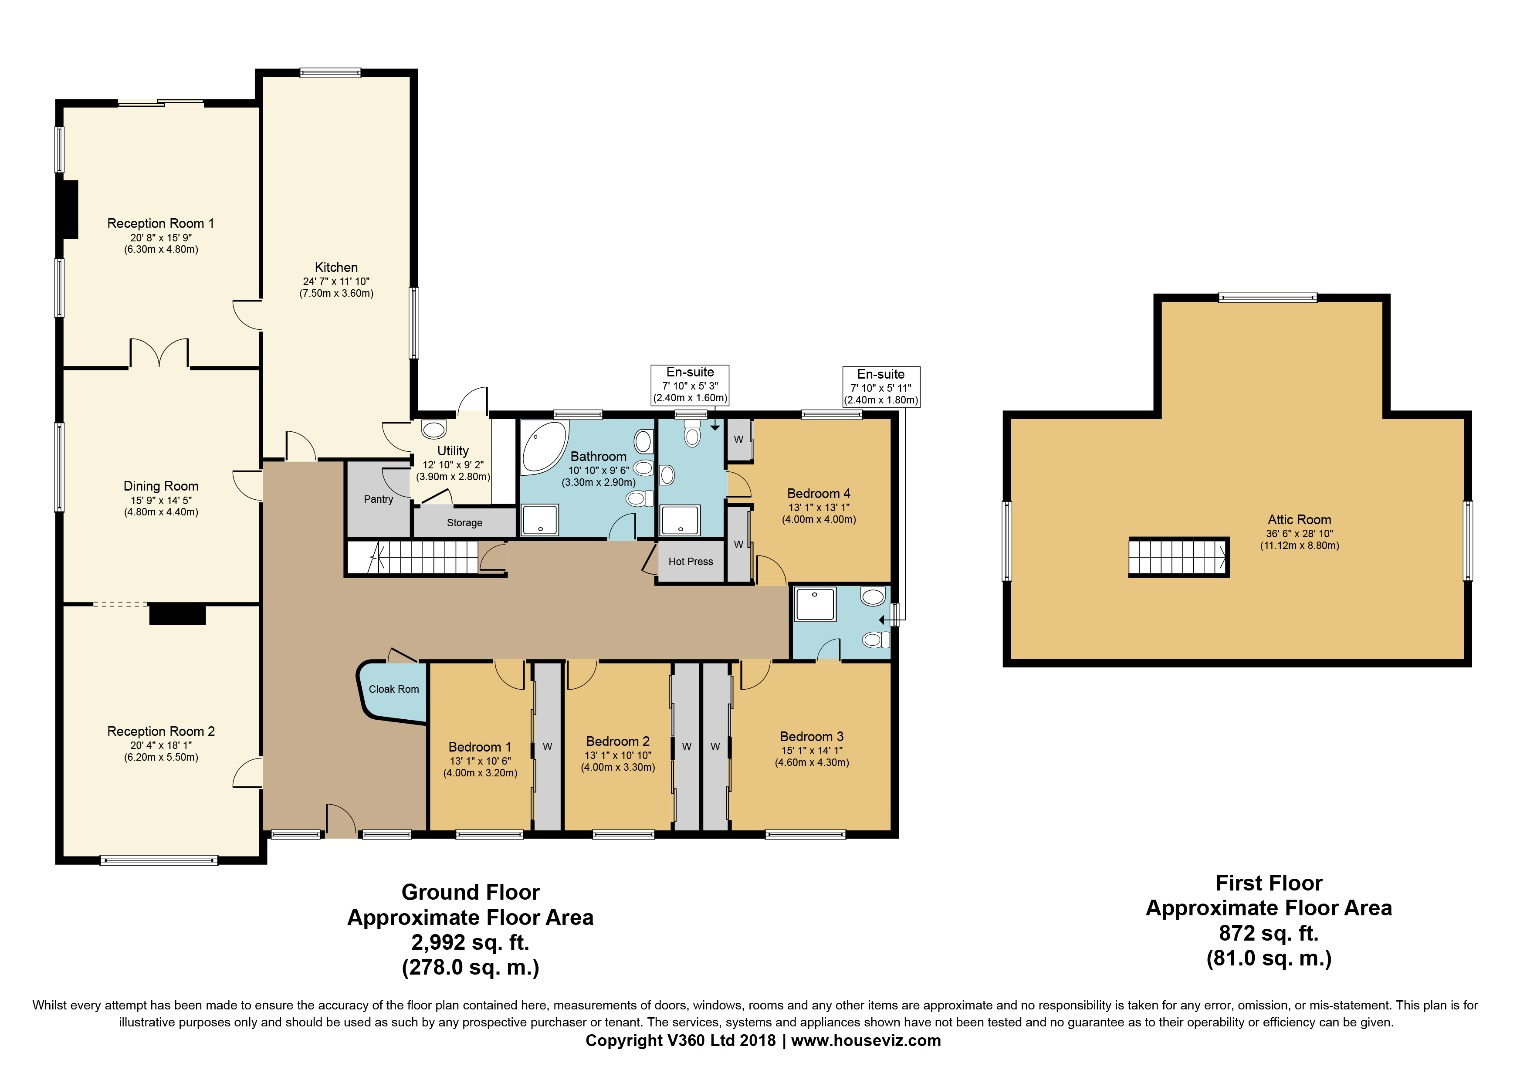 4 bed House for sale on Marahill, Kingscourt, Co. Cavan - Property Floorplan